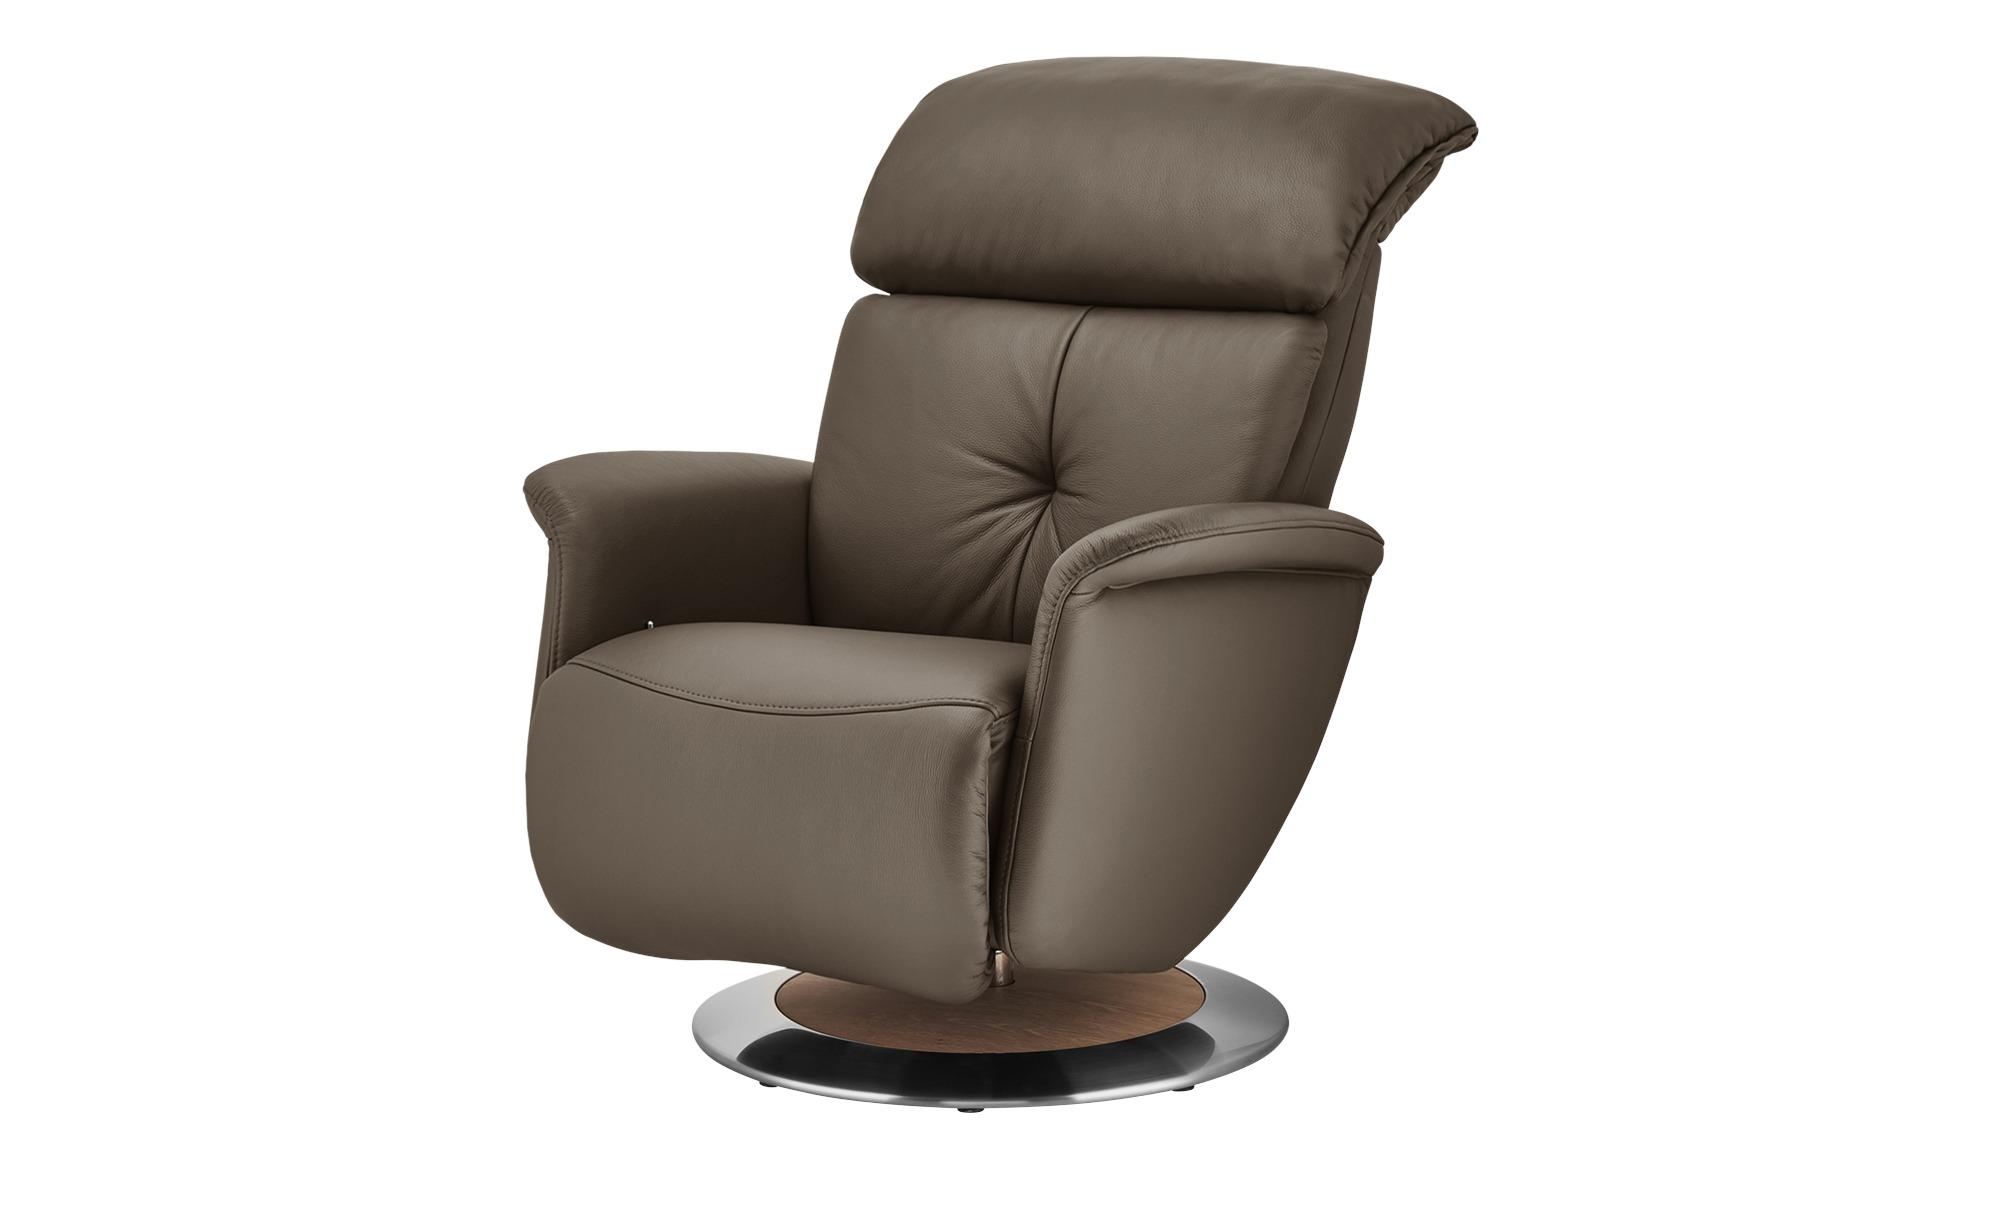 himolla Funktionssessel  7708 ¦ braun ¦ Maße (cm): B: 79 H: 99 T: 101 Polstermöbel > Sessel > Ledersessel - Höffner